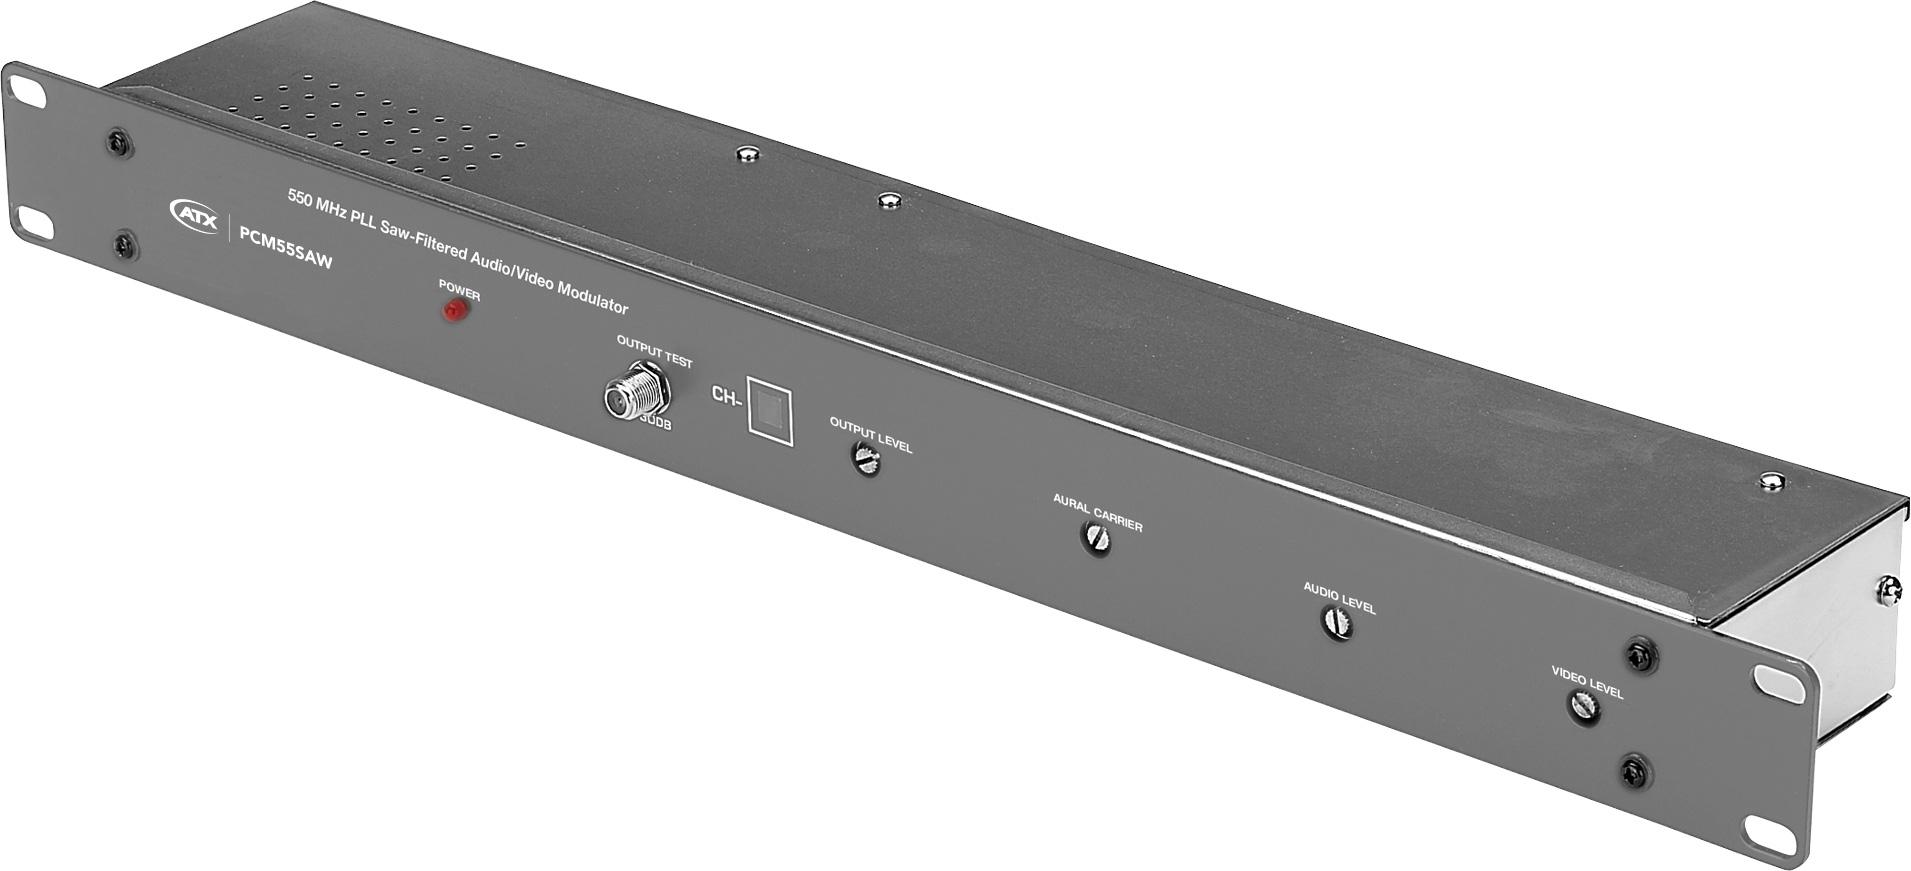 Video To Rf Modulator 189 Mhz